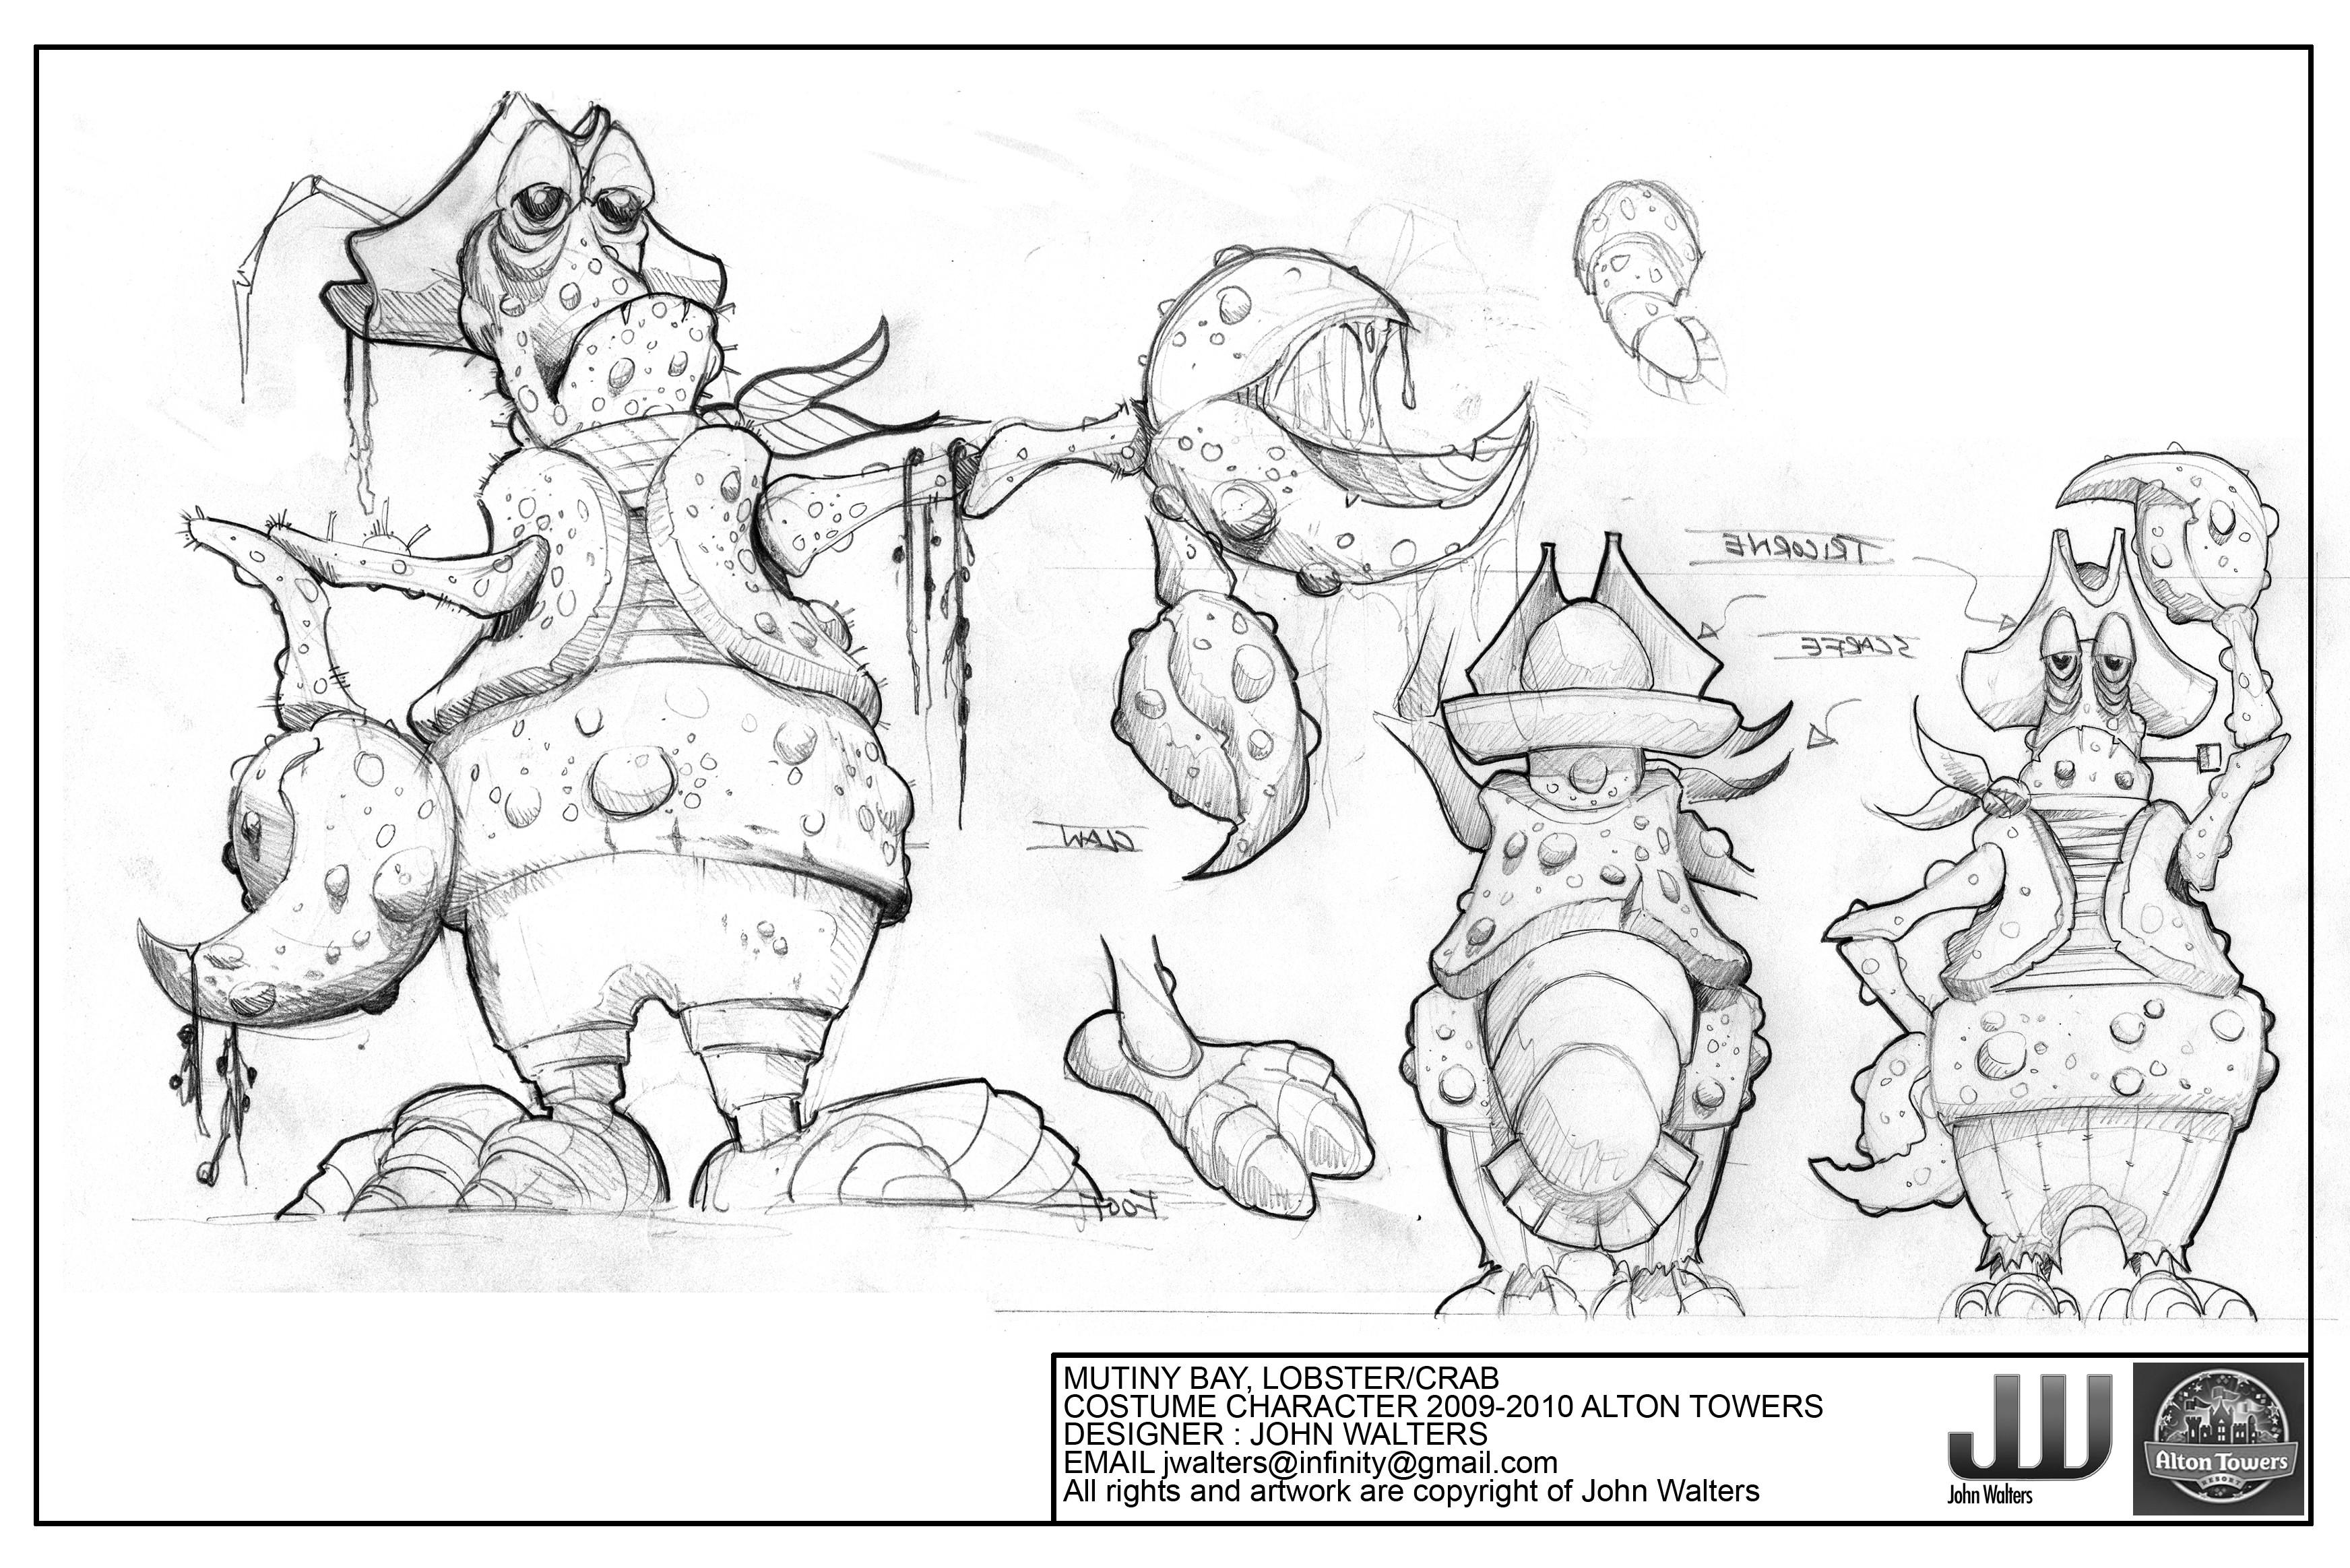 Initial Lobster Design/Idea